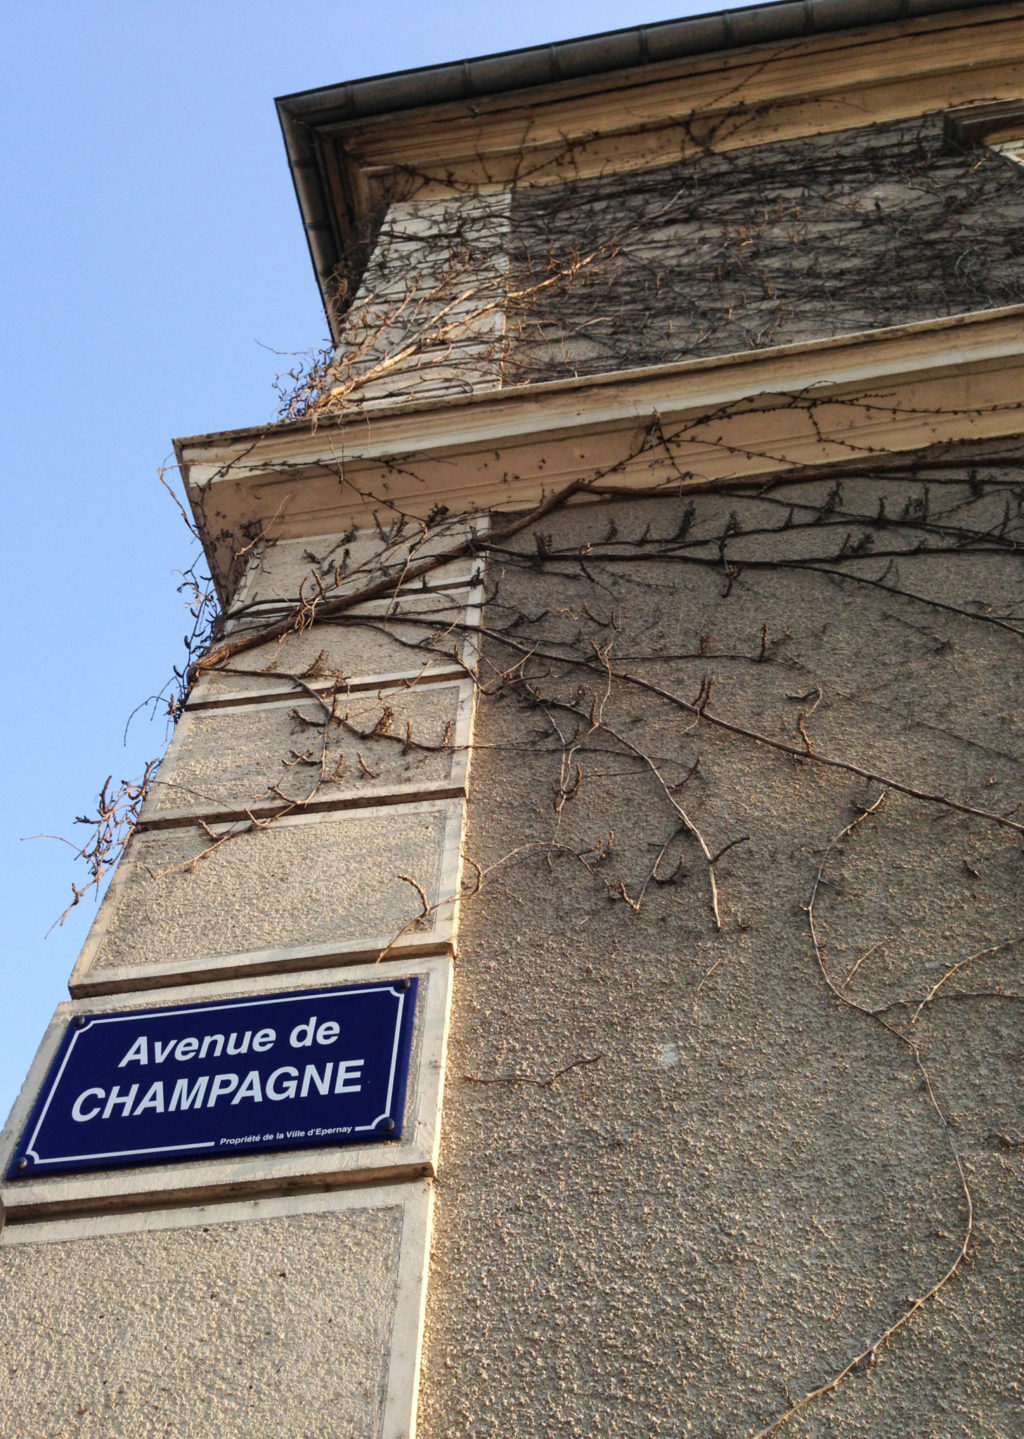 Avenue de Champagne. Photo by Gloria J. Chang.